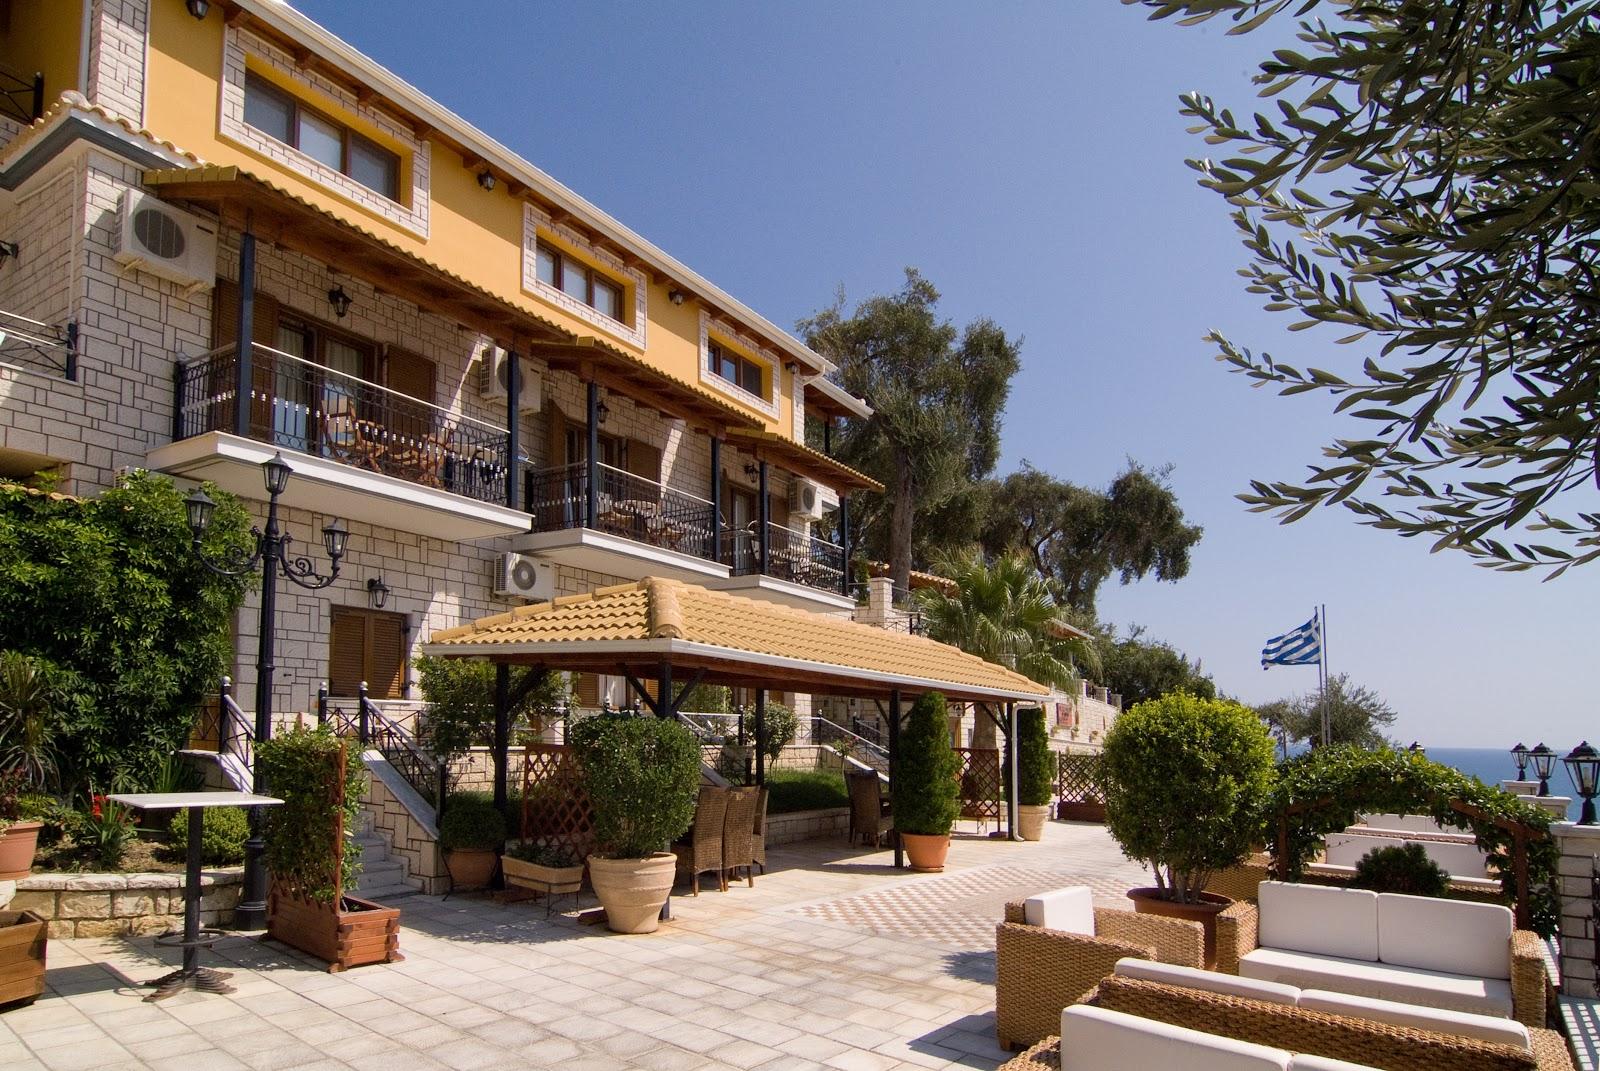 Parga hotels sunset hotel in parga greece for Sunset lodge